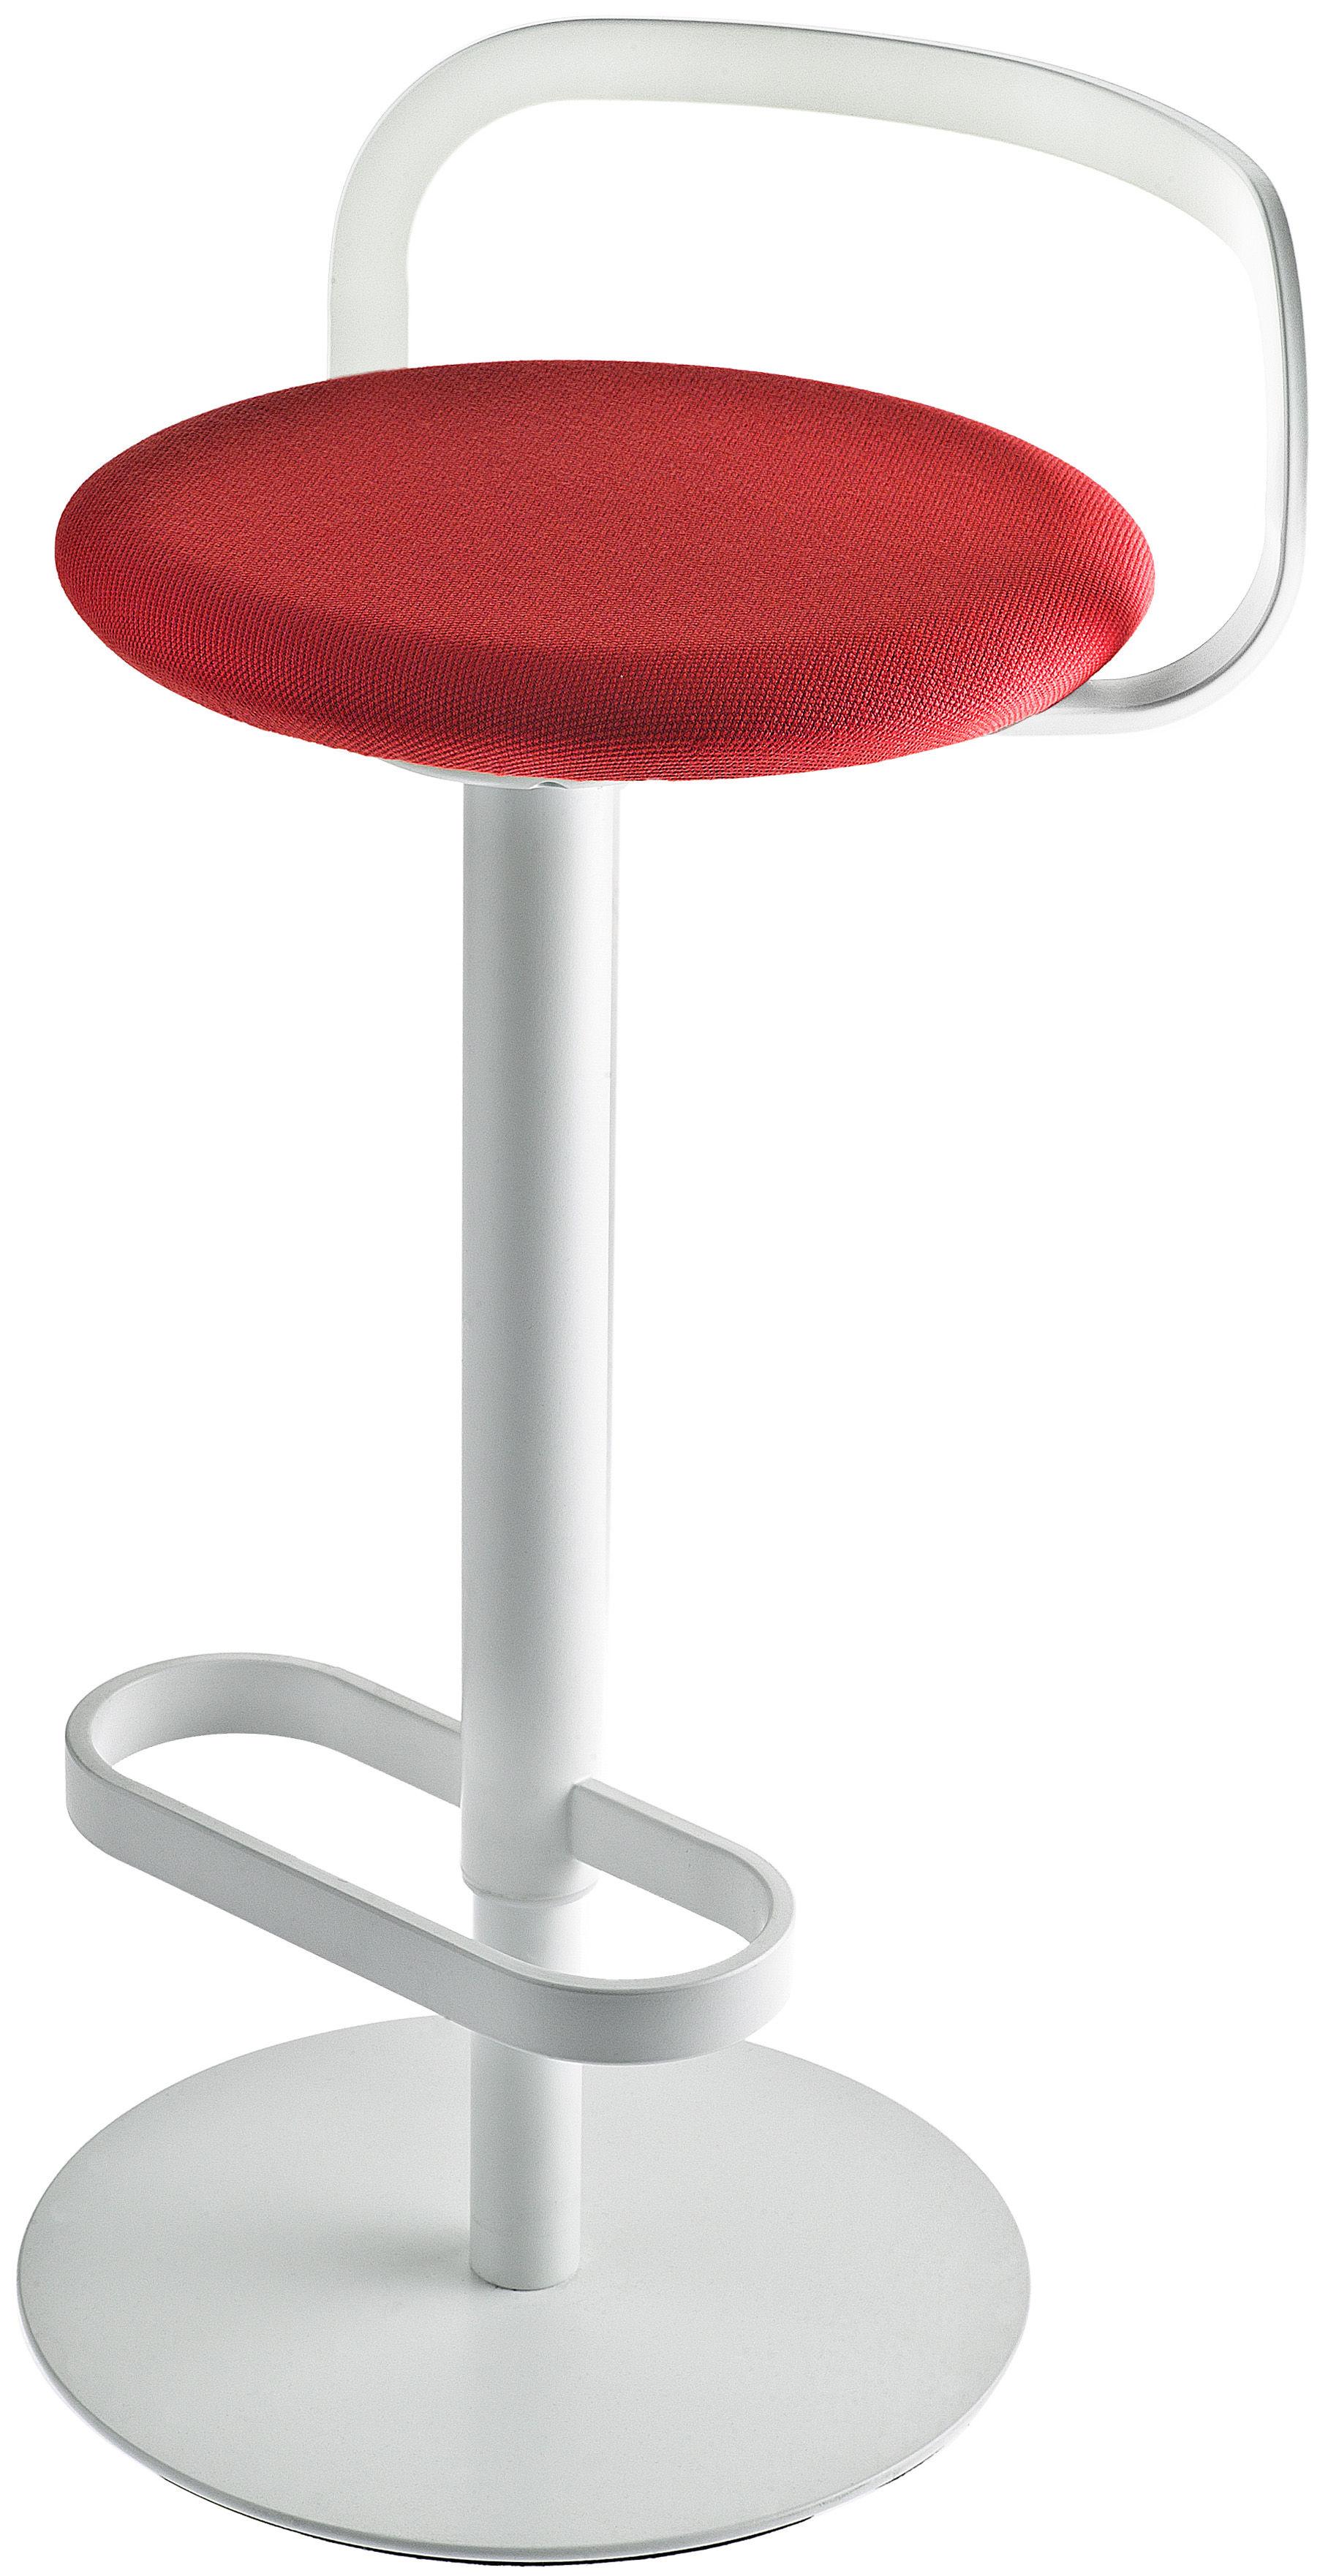 Mak Adjustable bar stool Pivoting Fabric padded seat  : 2602e8a8 0d7d 445a 8e92 1067f034f63b from www.madeindesign.co.uk size 1805 x 3523 jpeg 692kB